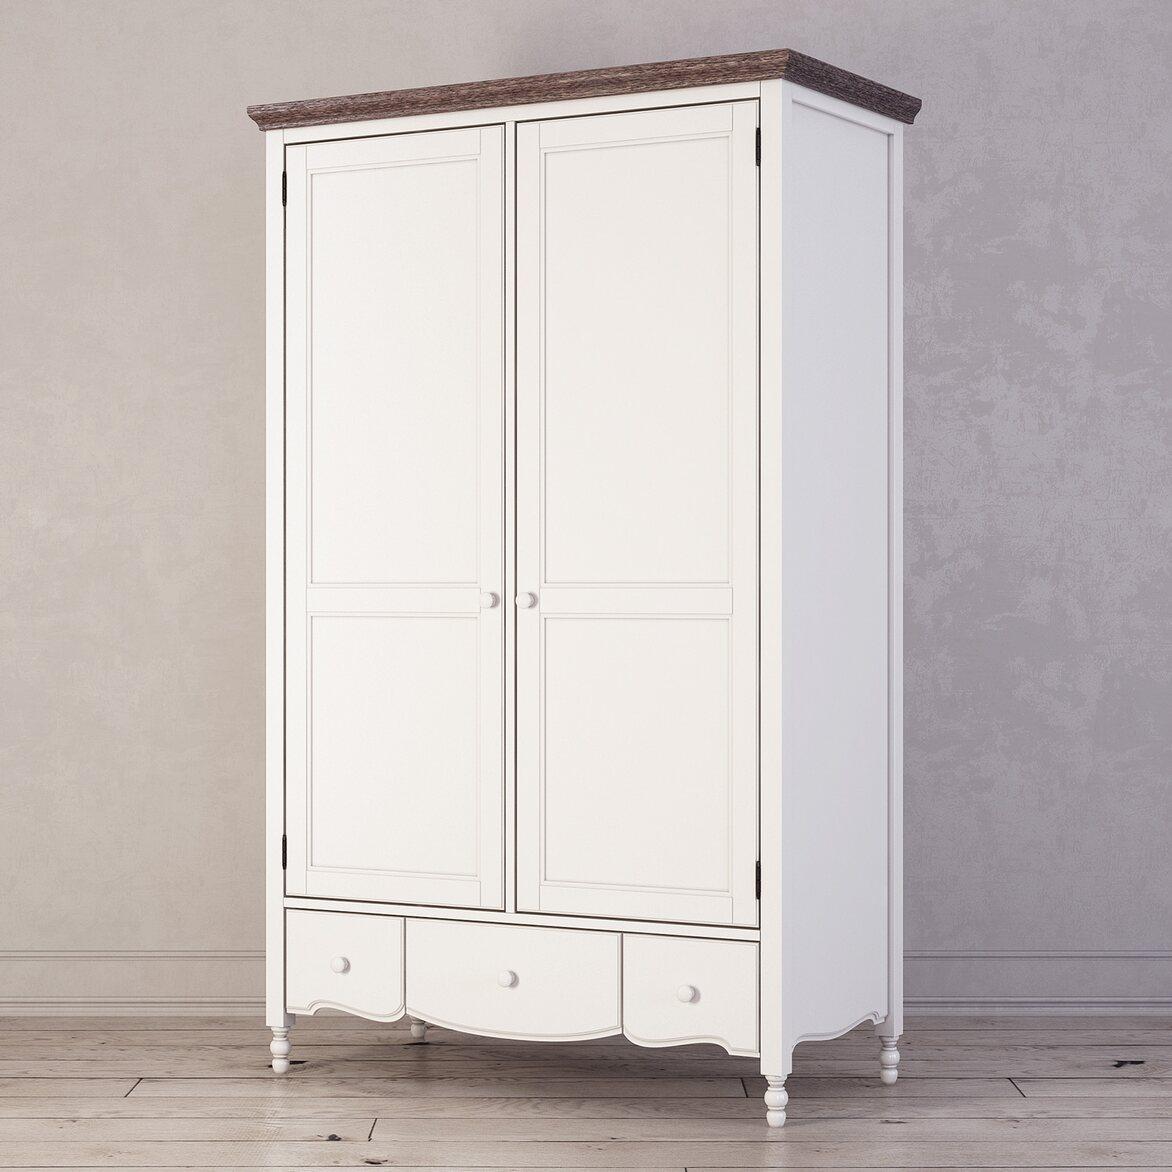 Шкаф двухстворчатый Leblanc, белый 2 | Платяные шкафы Kingsby